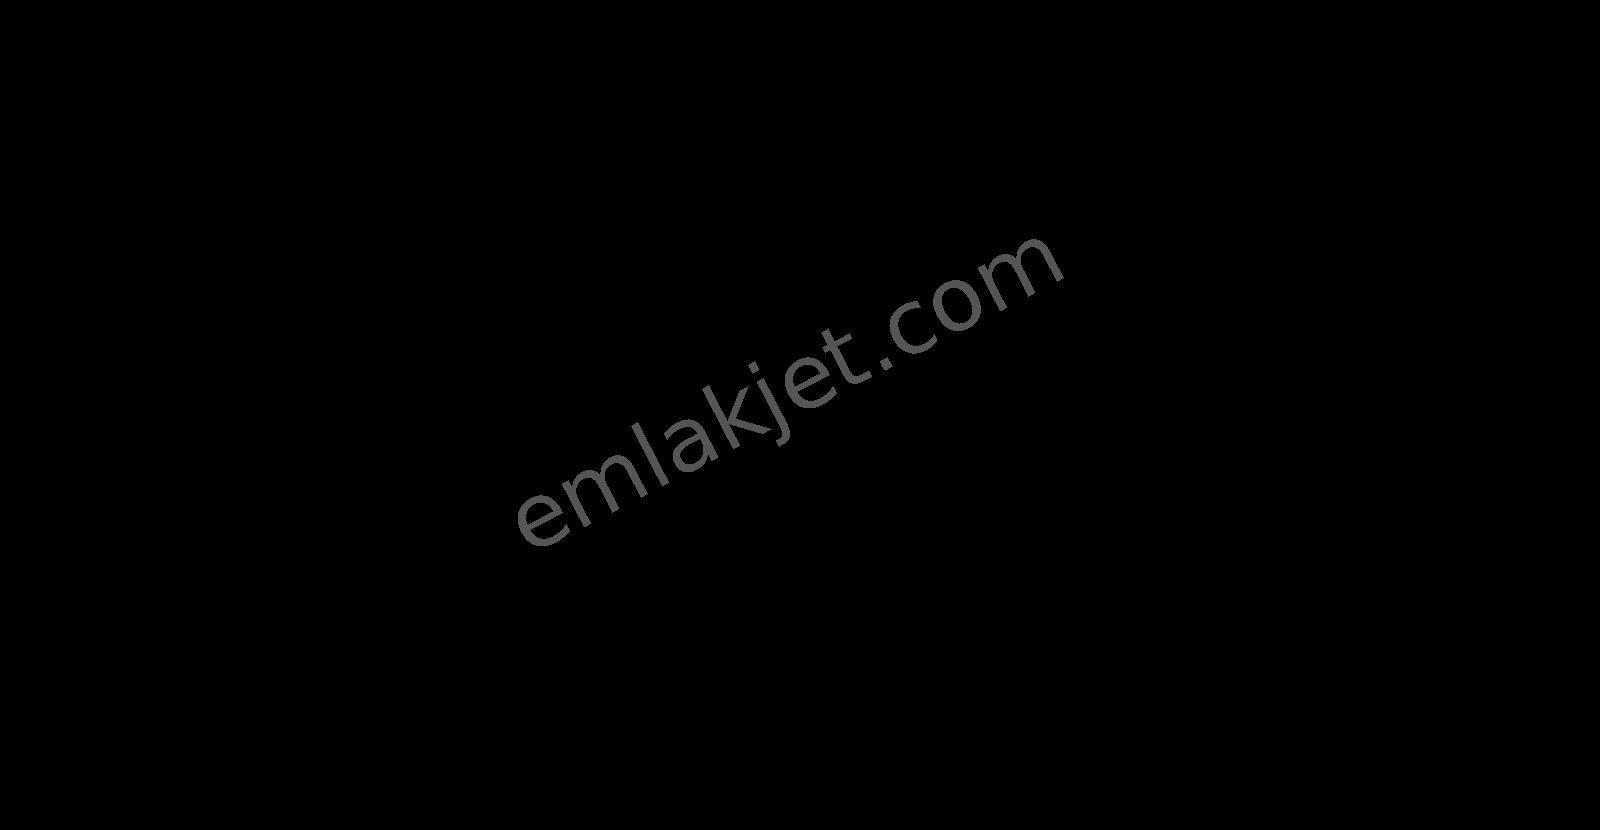 https://imaj.emlakjet.com/listing/9406389/8C014CAFCF3BA51D3E4CC2C704B774D29406389.jpg